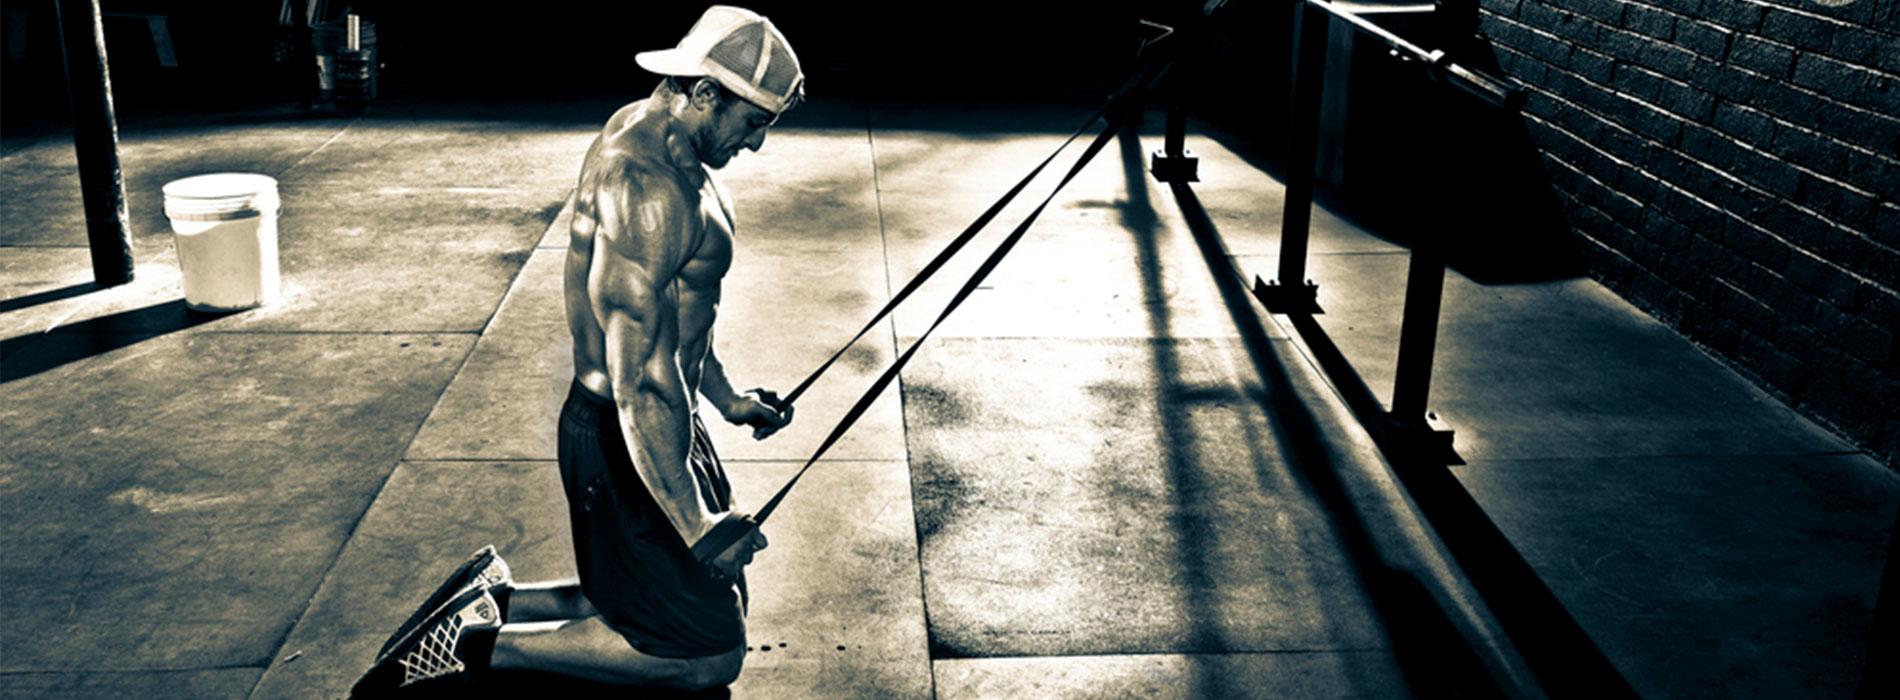 Metabolite Training (Metabolic Stress) - Evolved Training